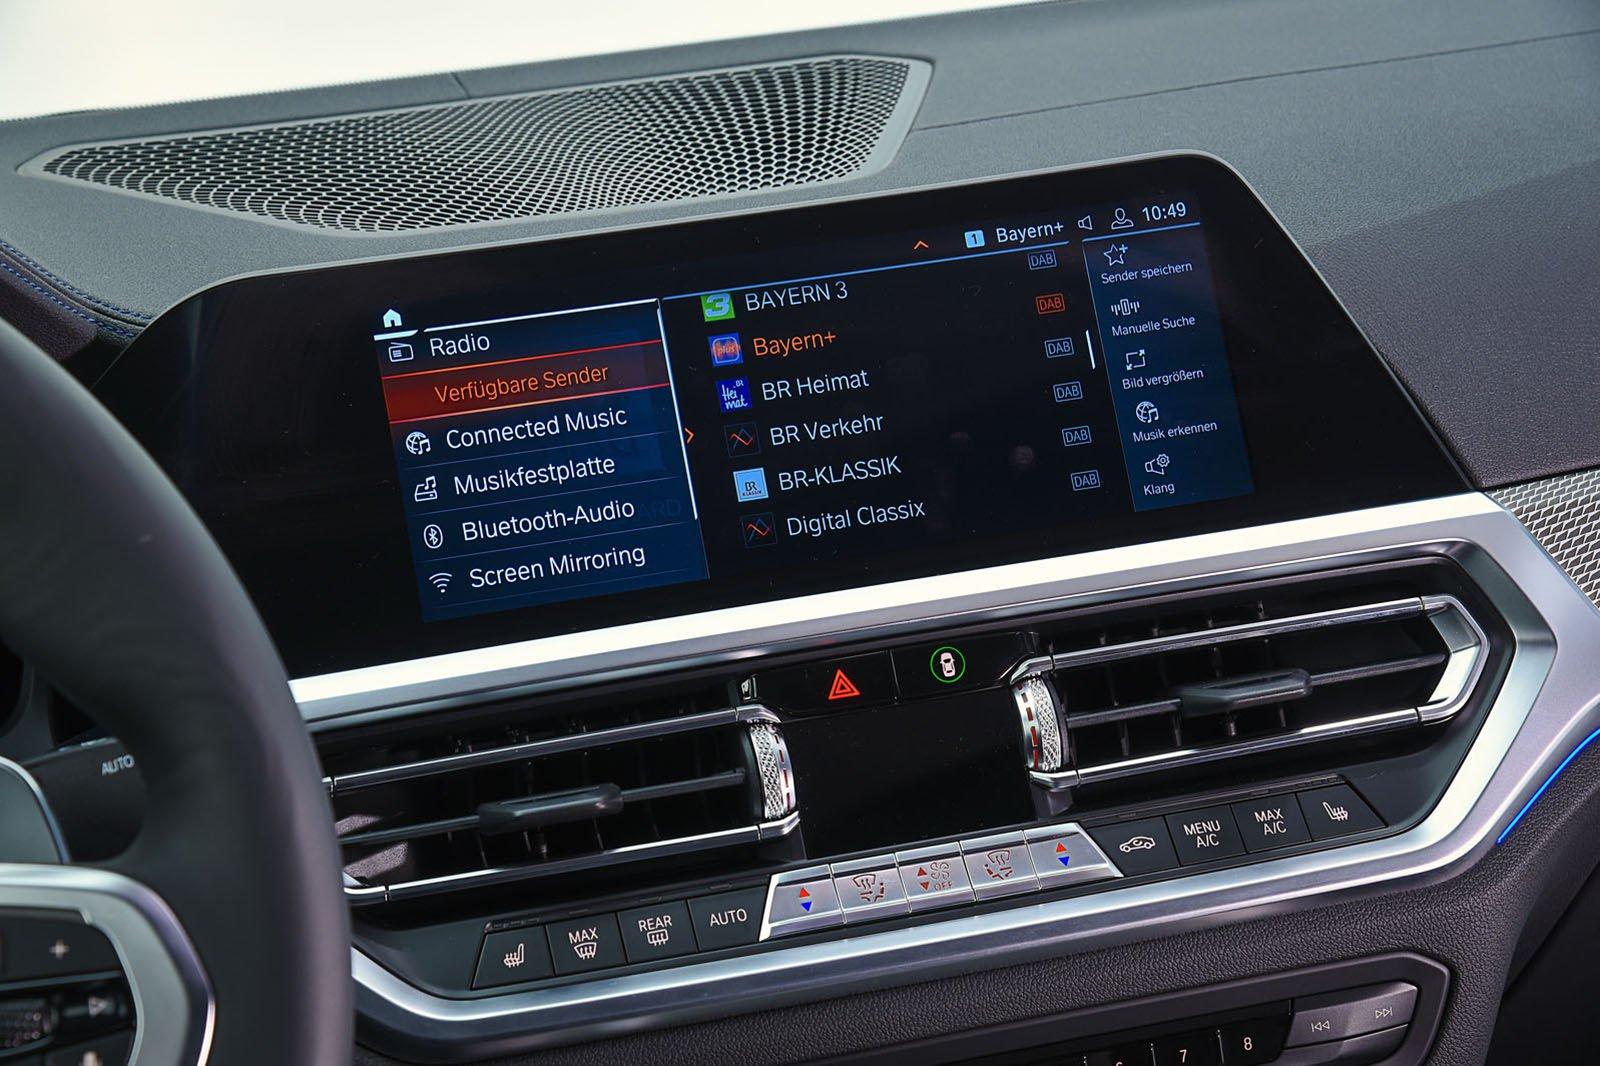 BMW 3 Series infotainment